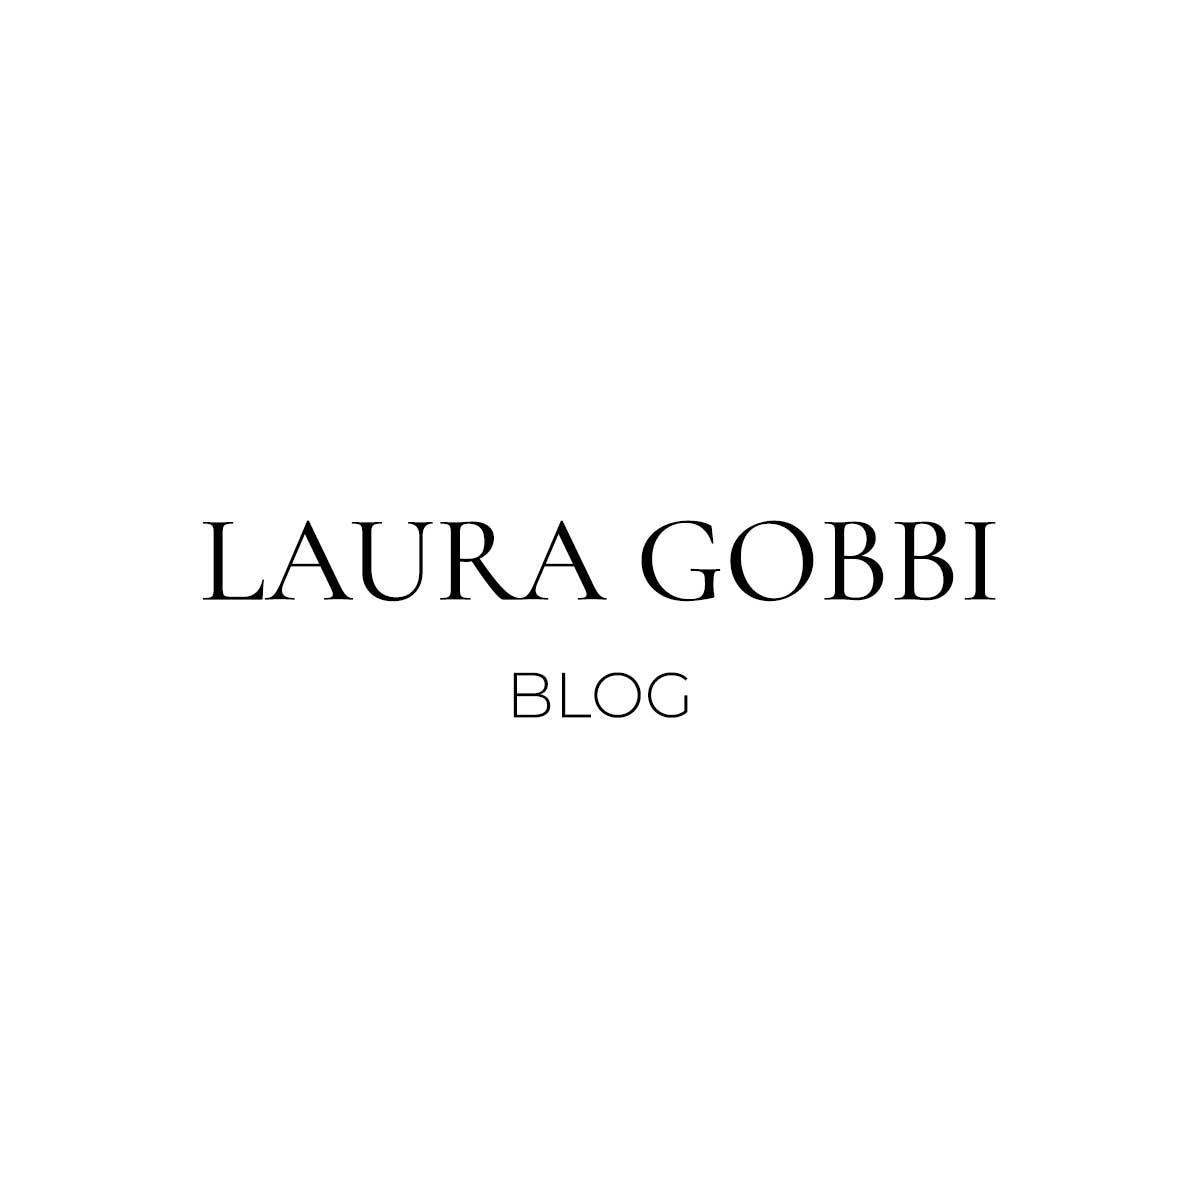 laura gobbi blog